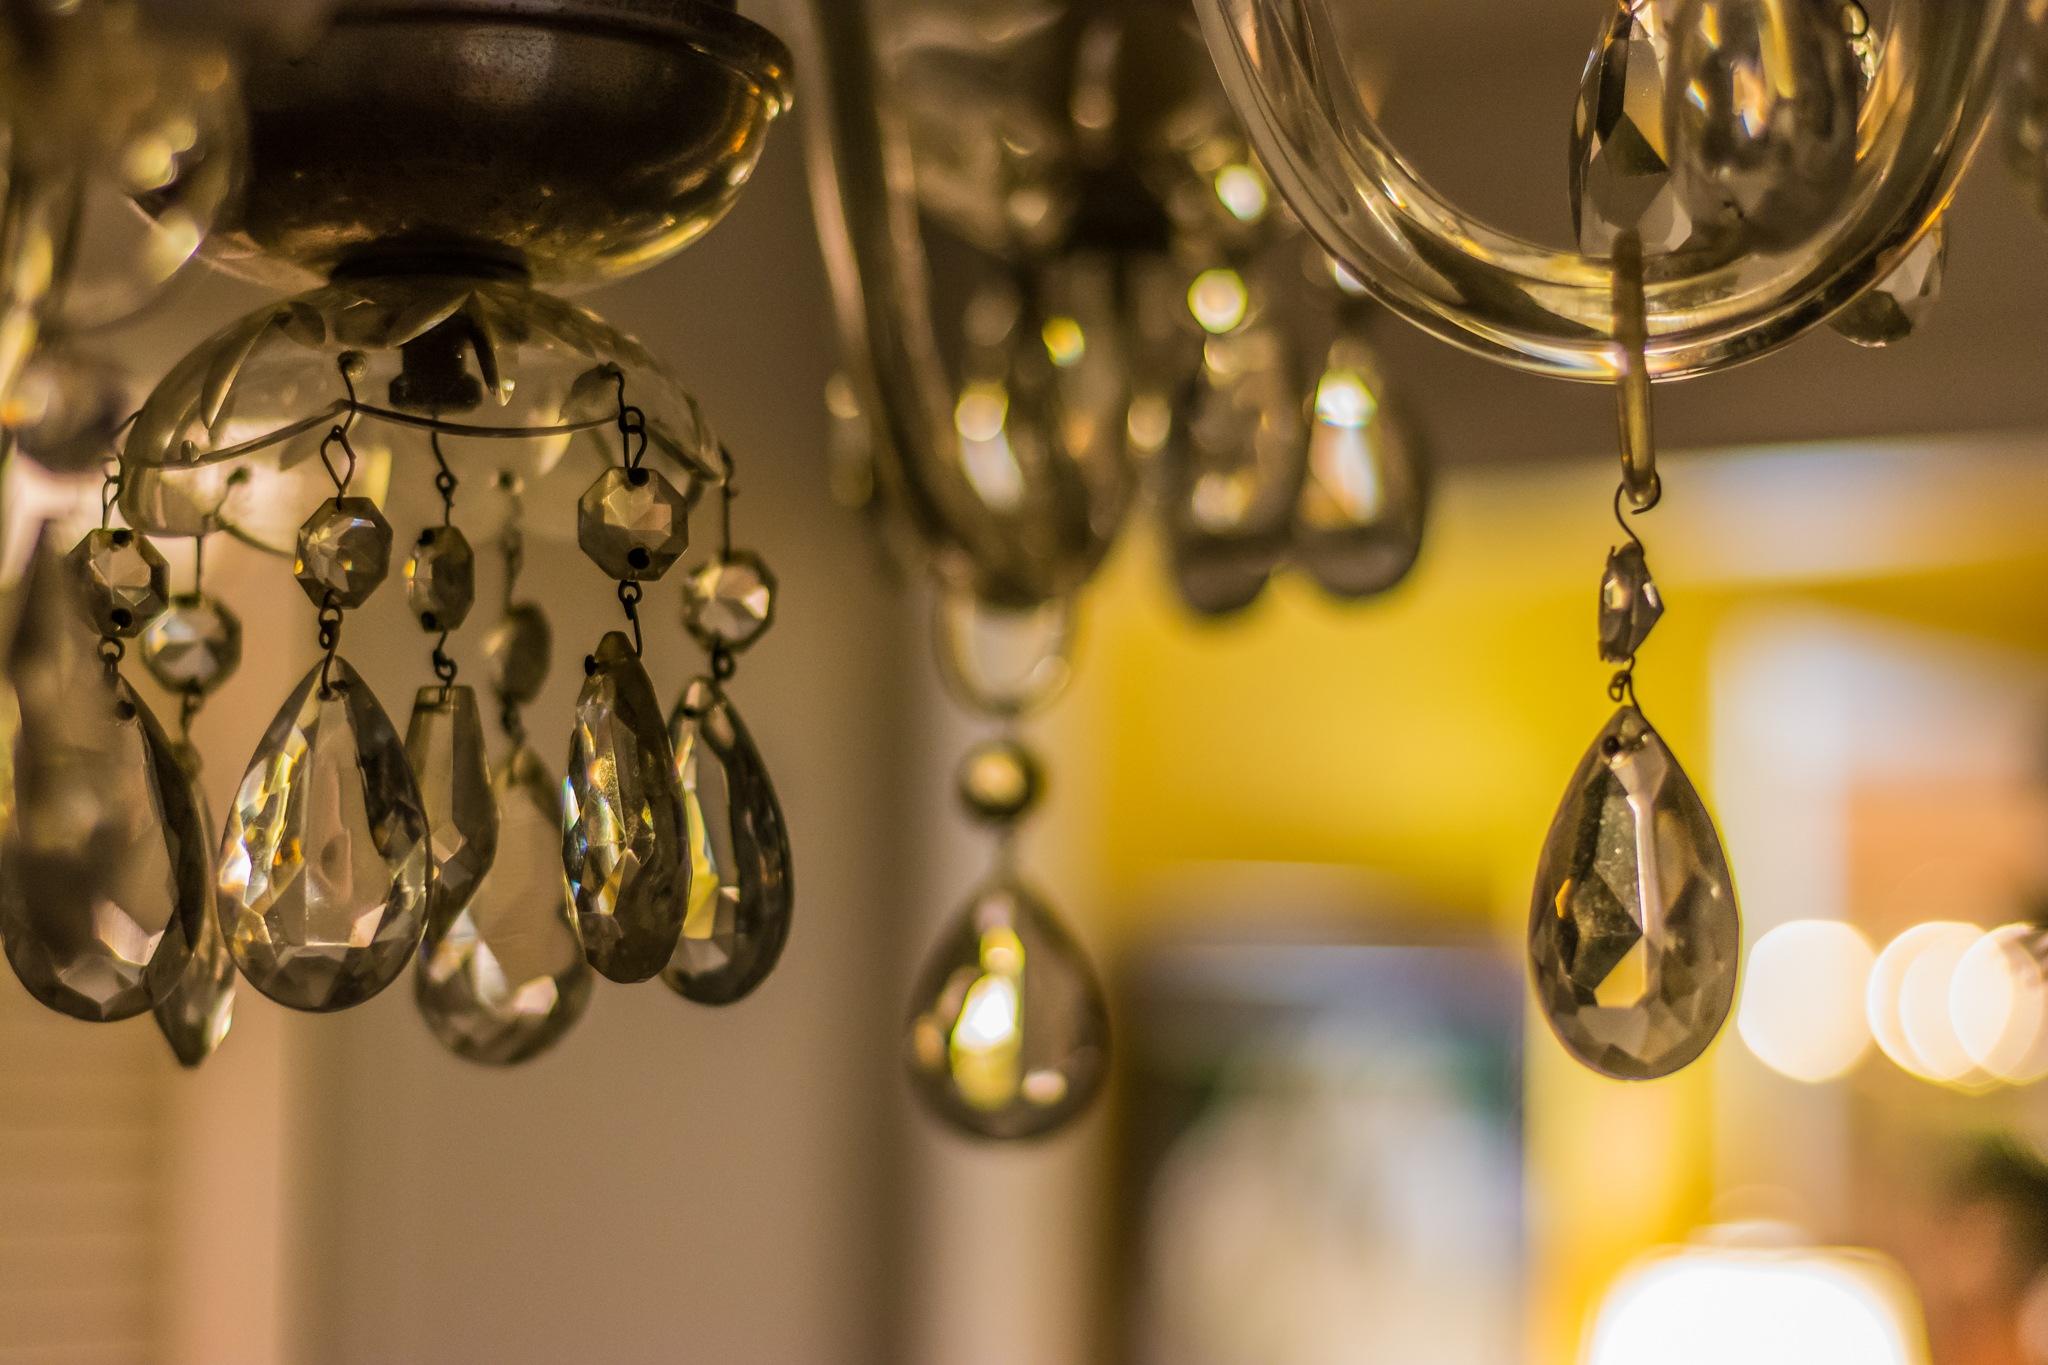 hanging glass by wacissa